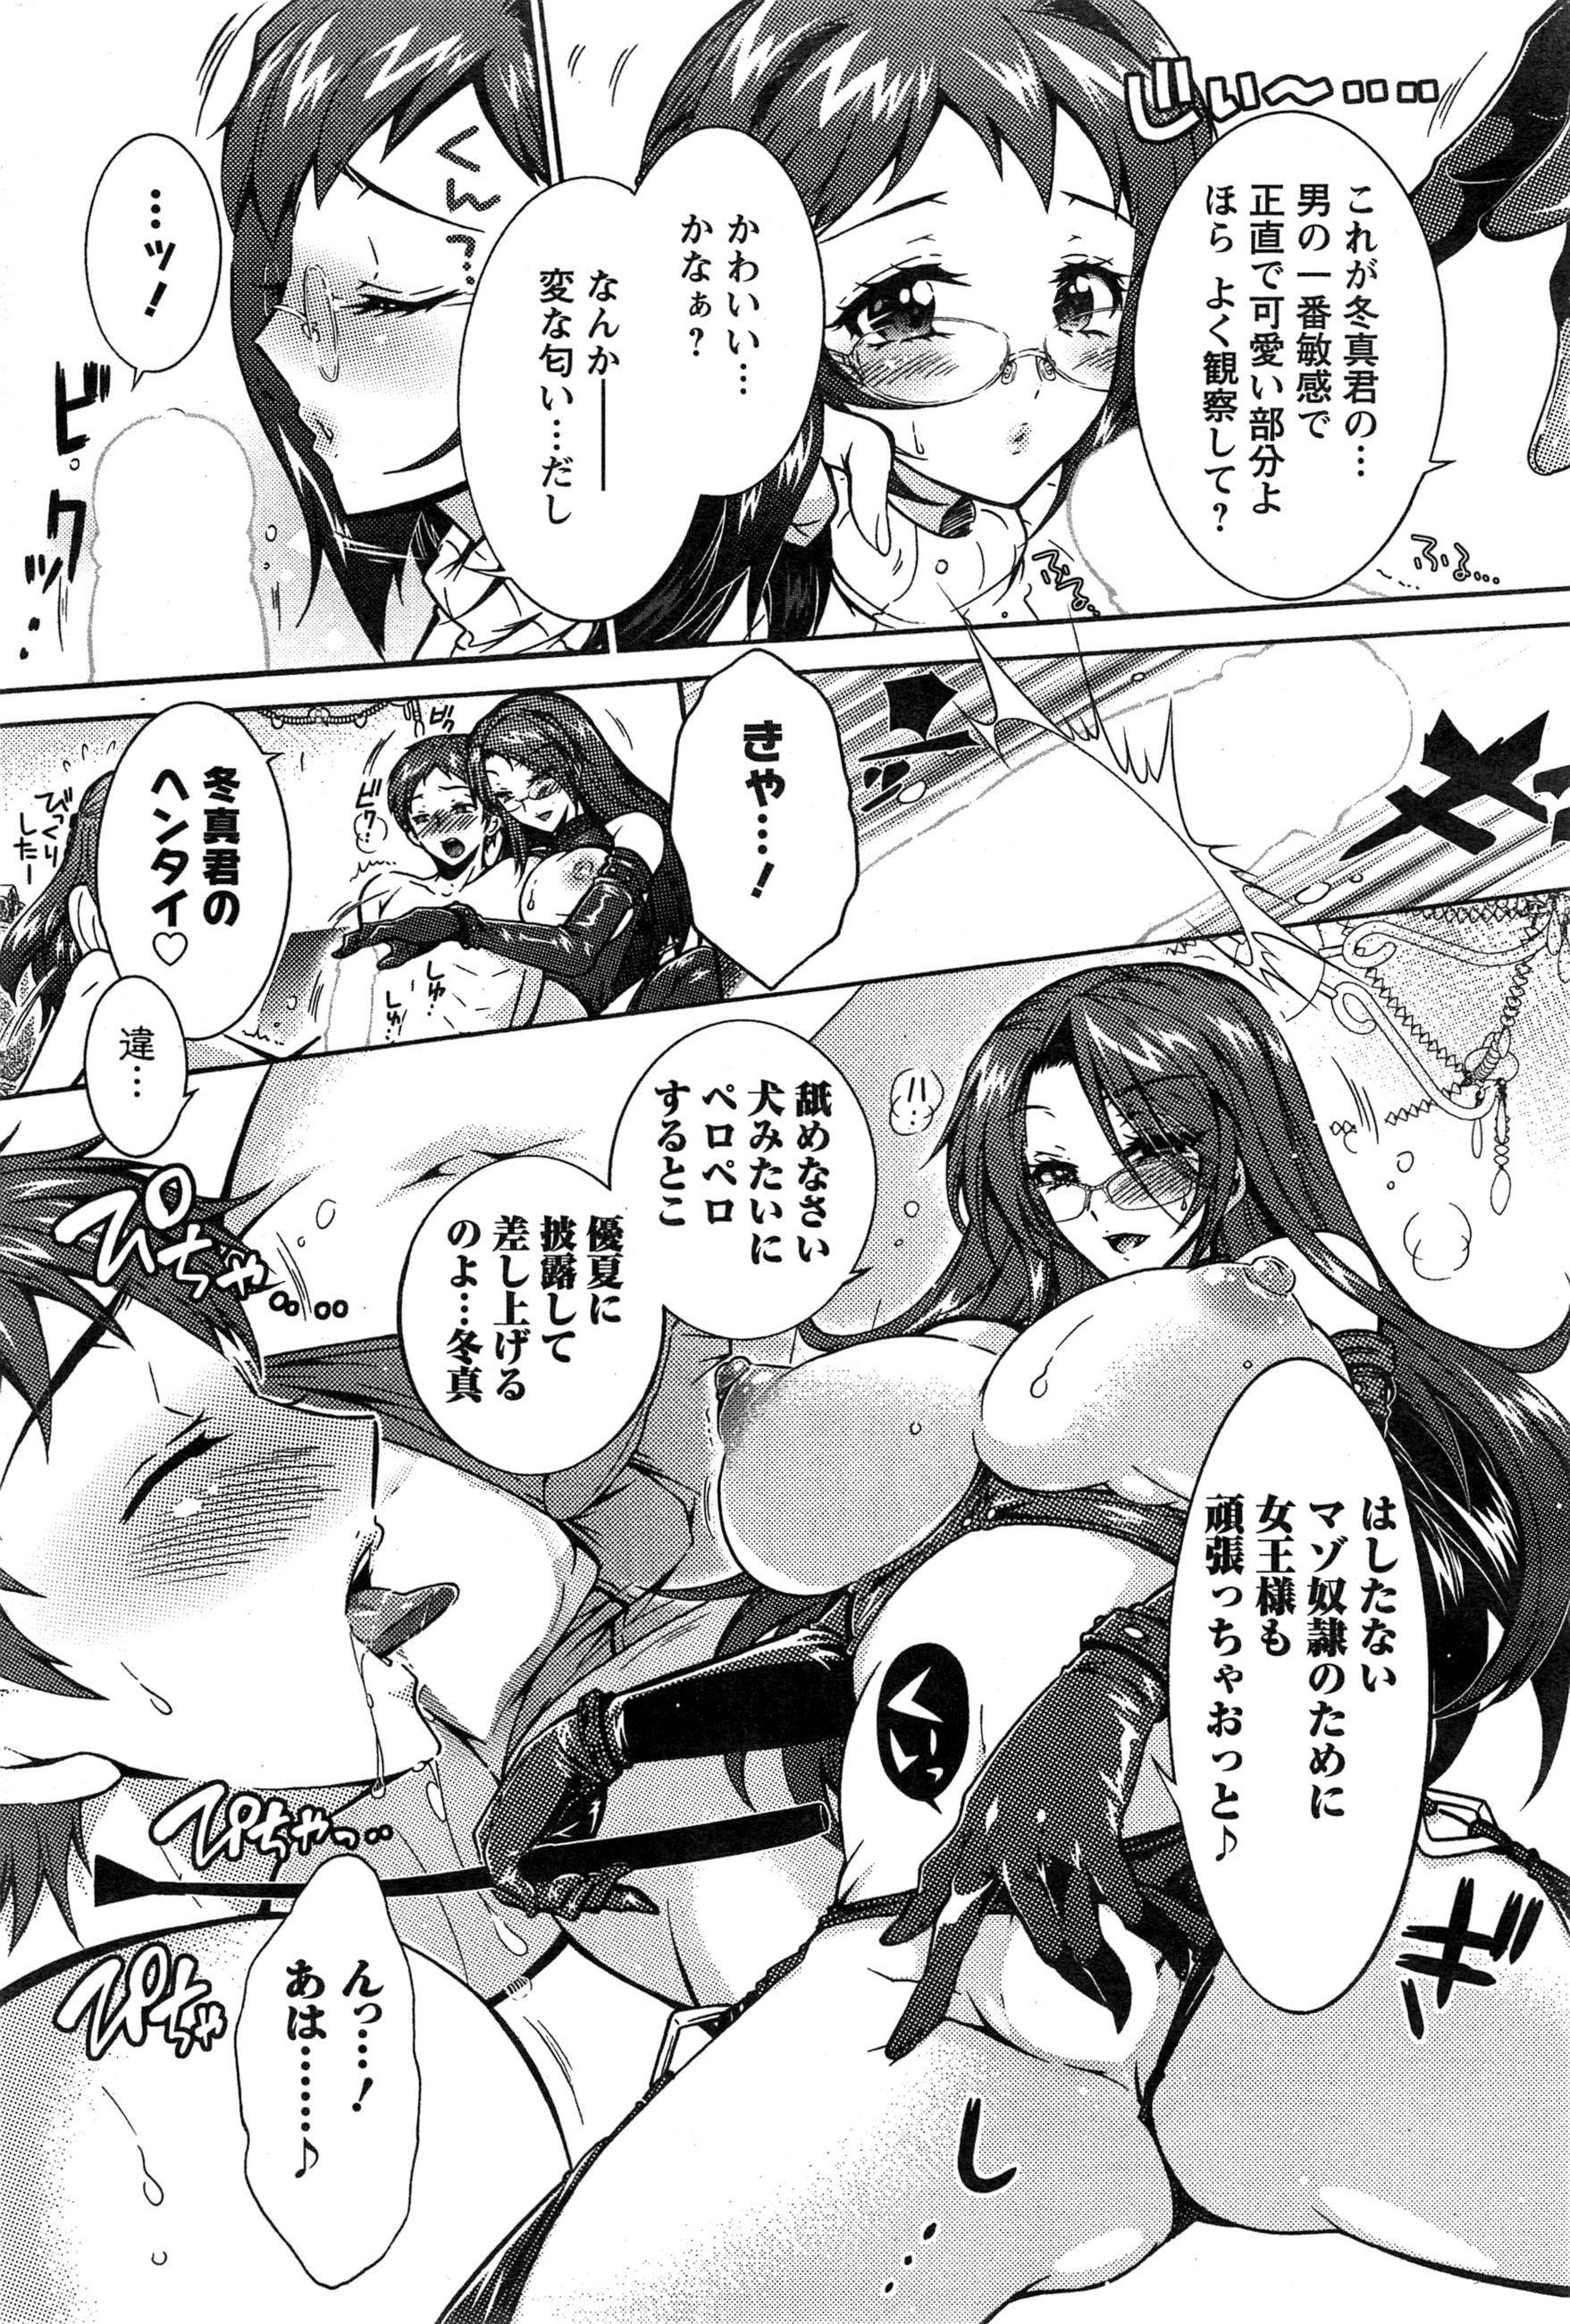 [Honda Arima] Sanshimai no Omocha - The Slave of Three Sisters Ch. 1-6 68